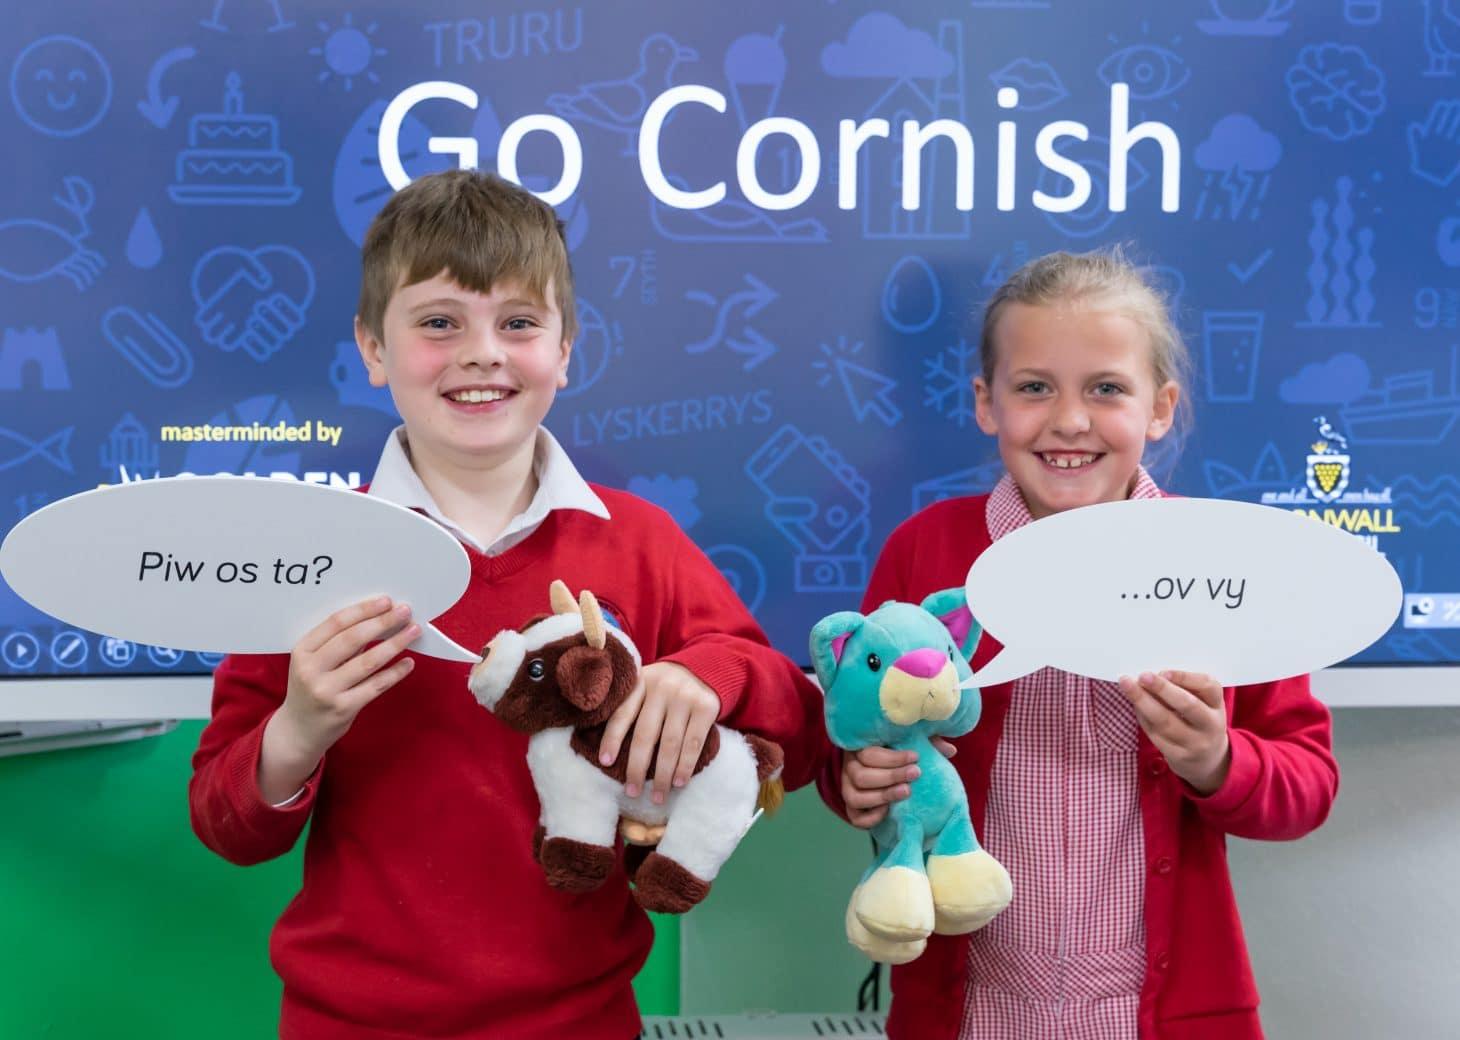 Schools across Cornwall are set to Go Cornish!